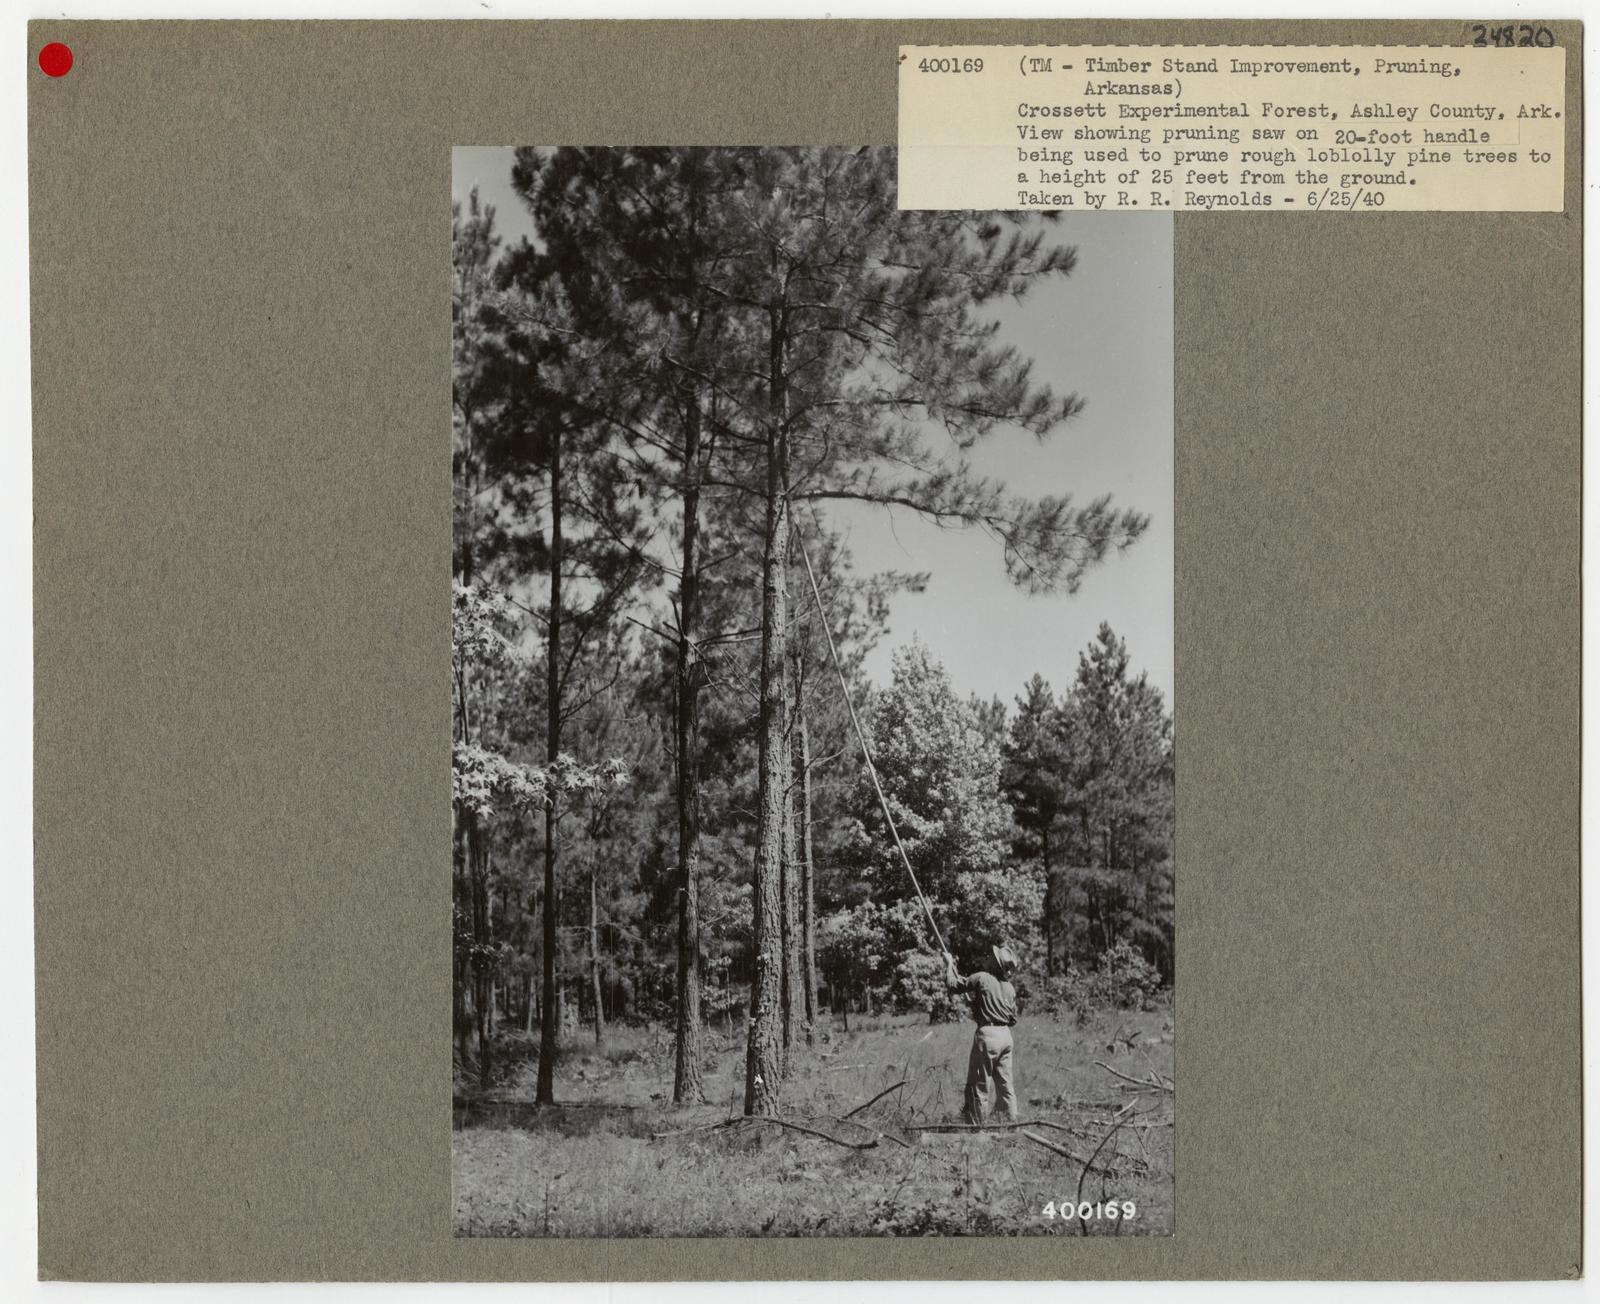 Pruning - Arkansas